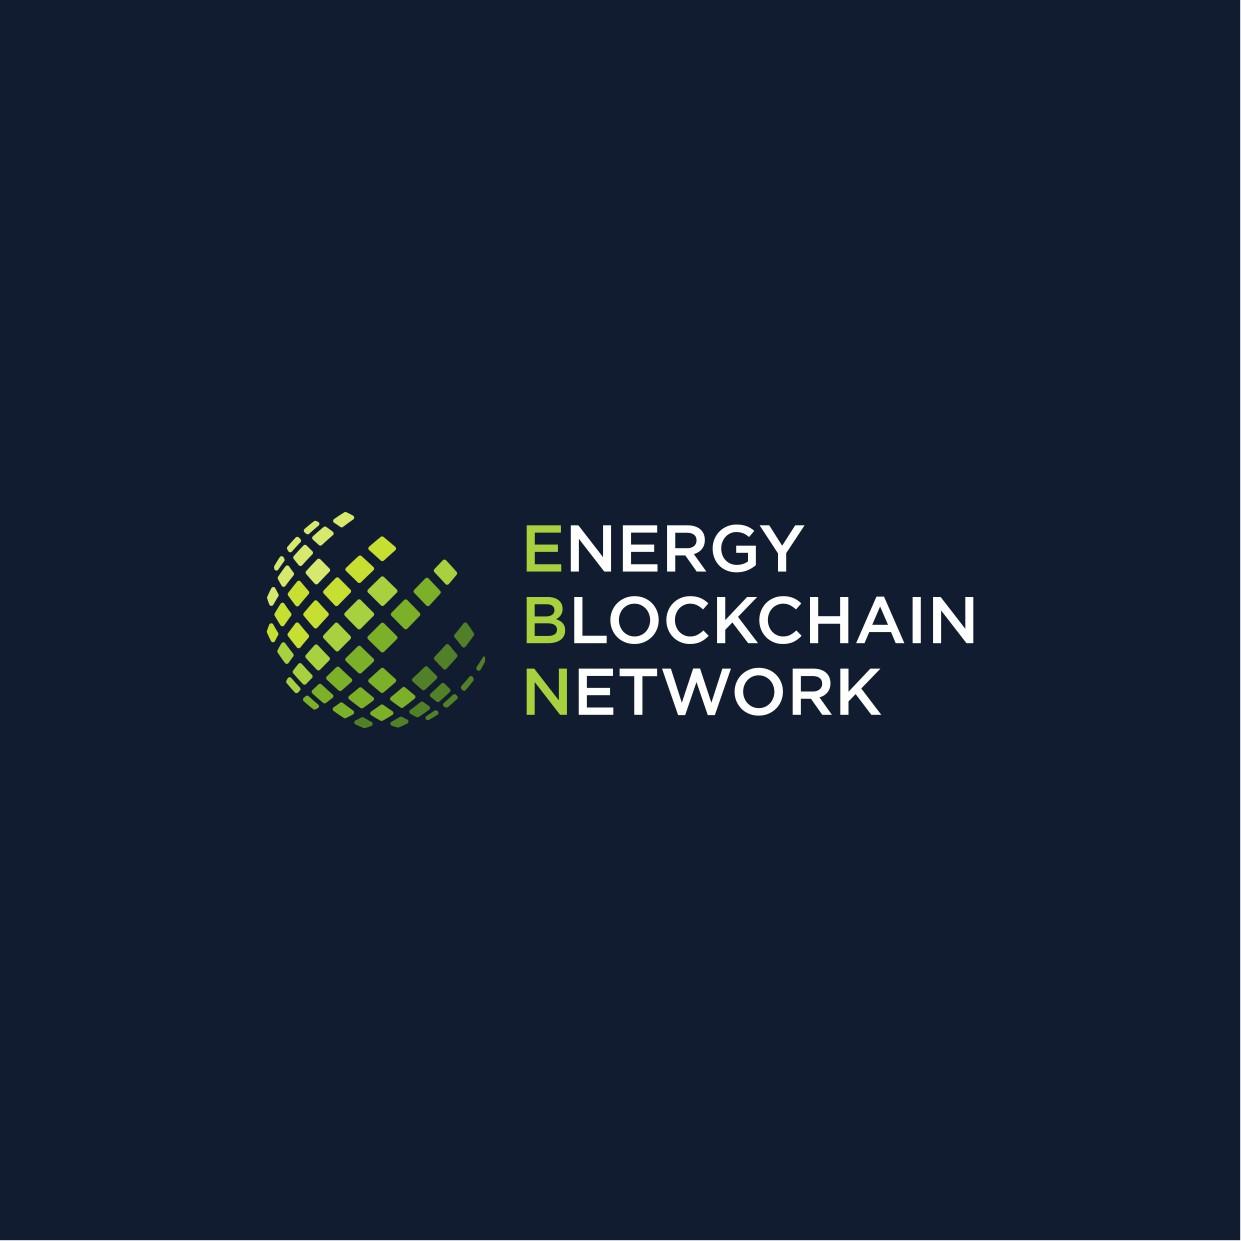 Blockchain+Energy firm needs a logo: creative, futuristic, cutting edge feel, freedom to innovate